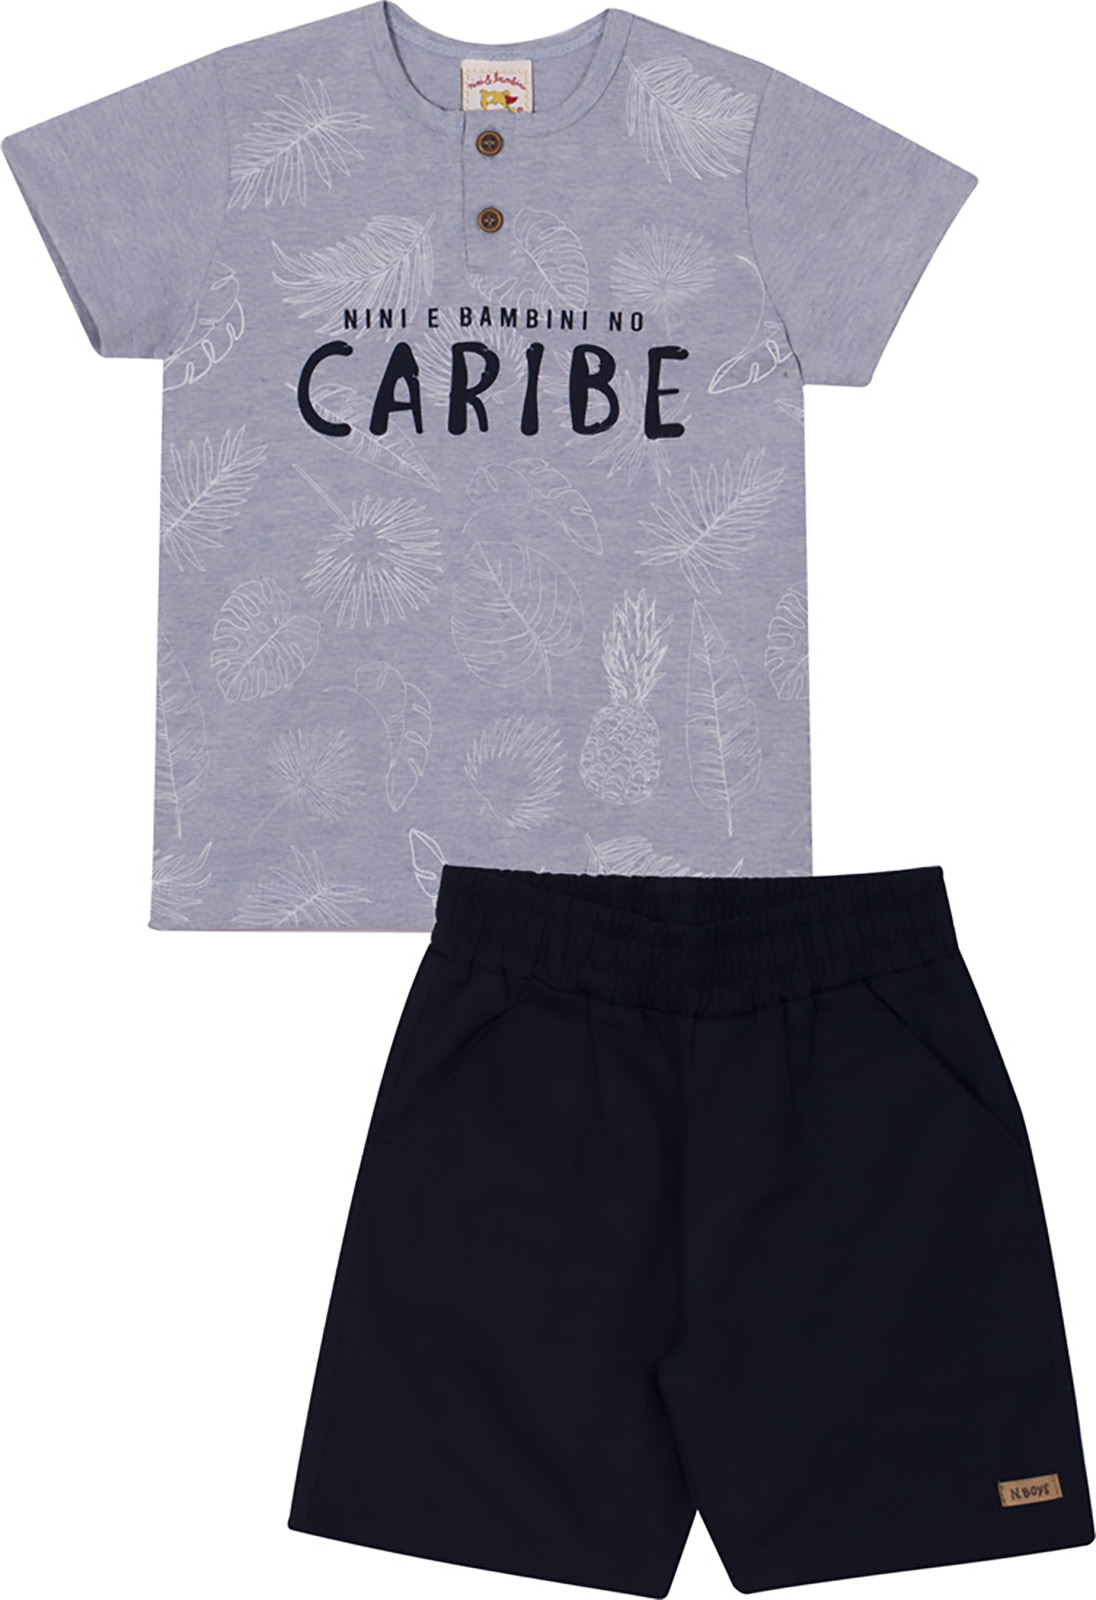 Conjunto Infantil Camiseta e Bermuda Nini&Bambini Caribe Marinho e Mescla